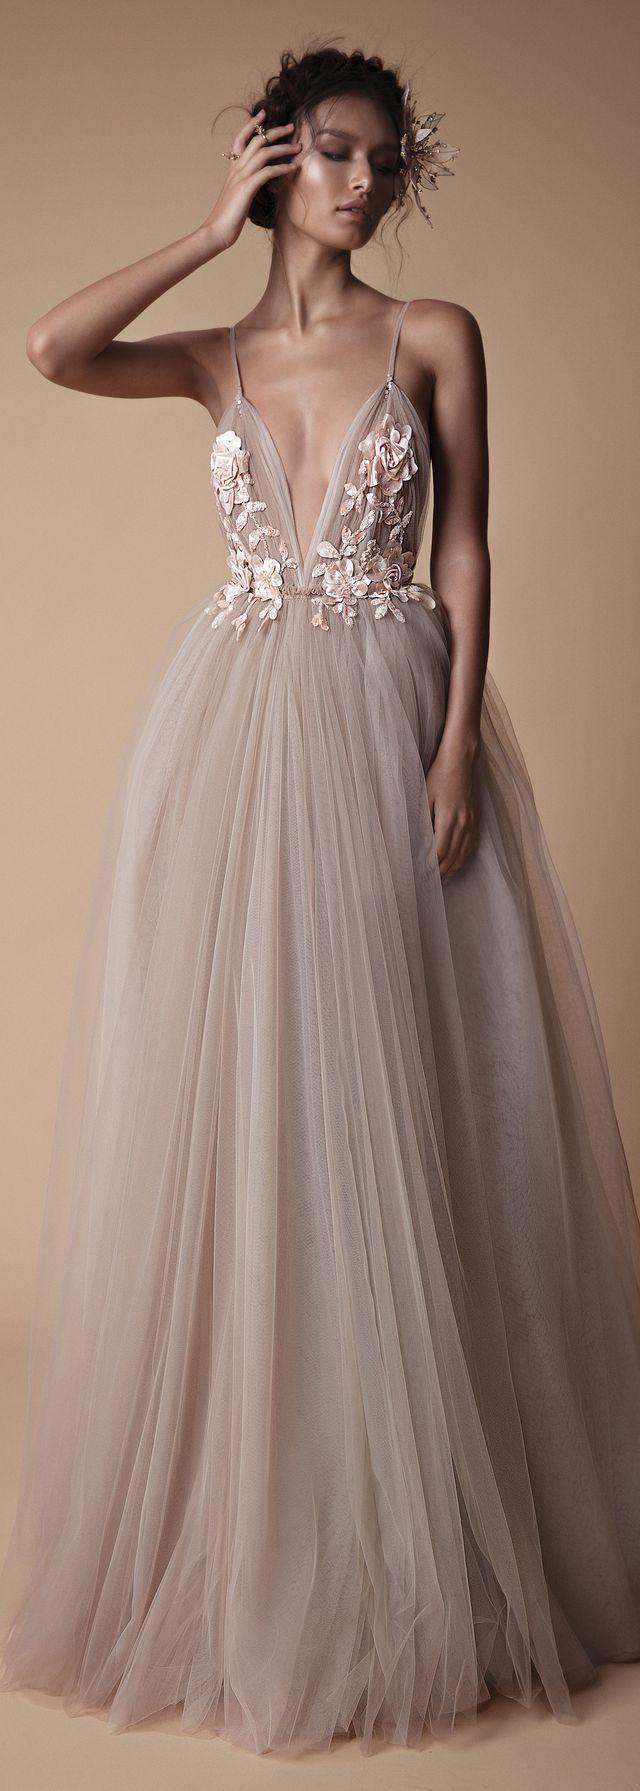 زفاف - BRIDAL.GOWNS